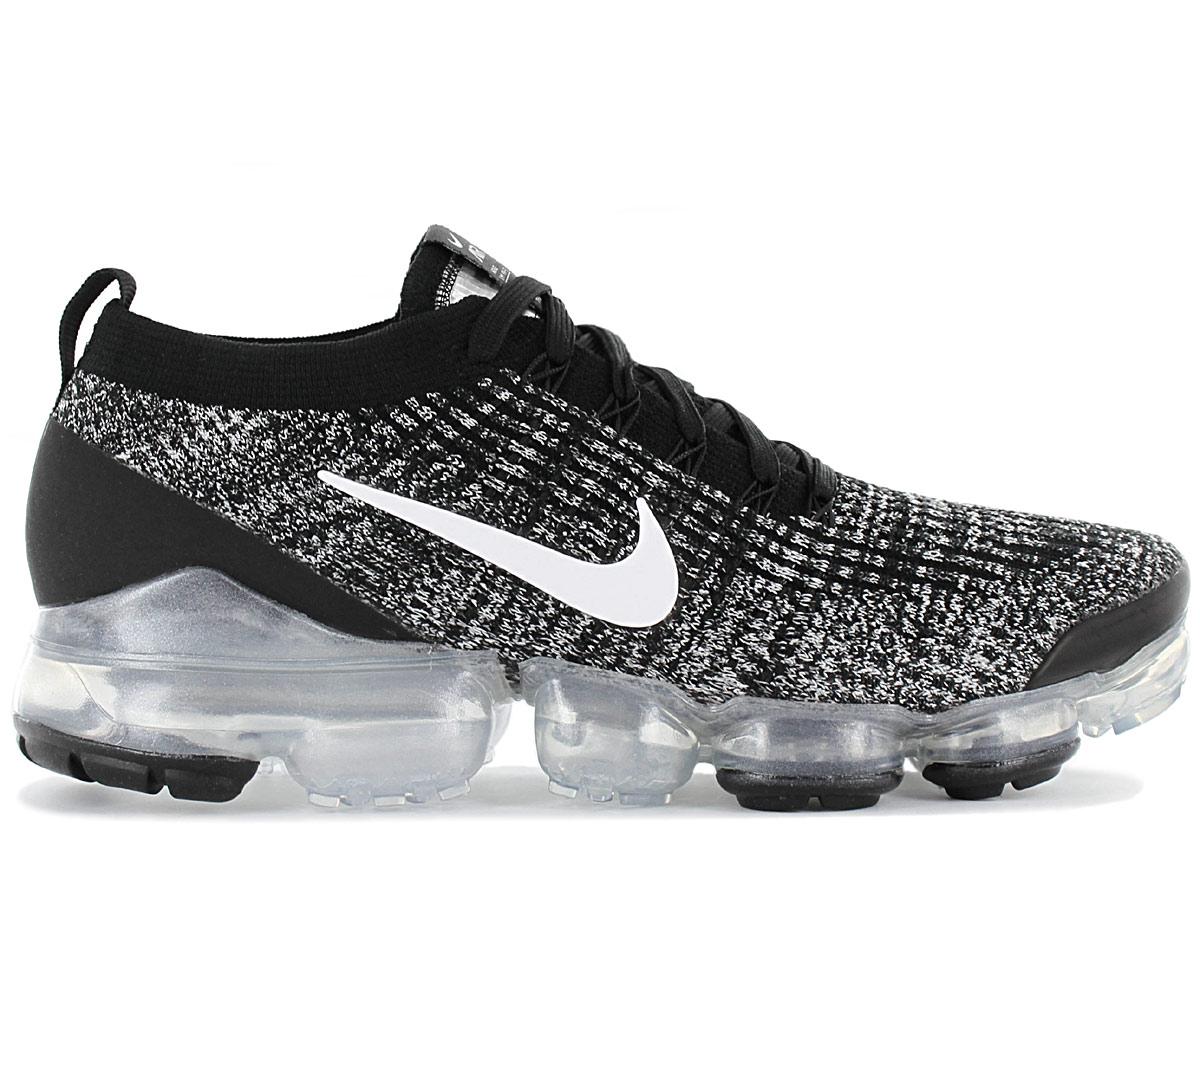 Details zu Nike Air VaporMax Flyknit 3 Herren Sneaker AJ6900 001 Grau Schuhe Sportschuh NEU